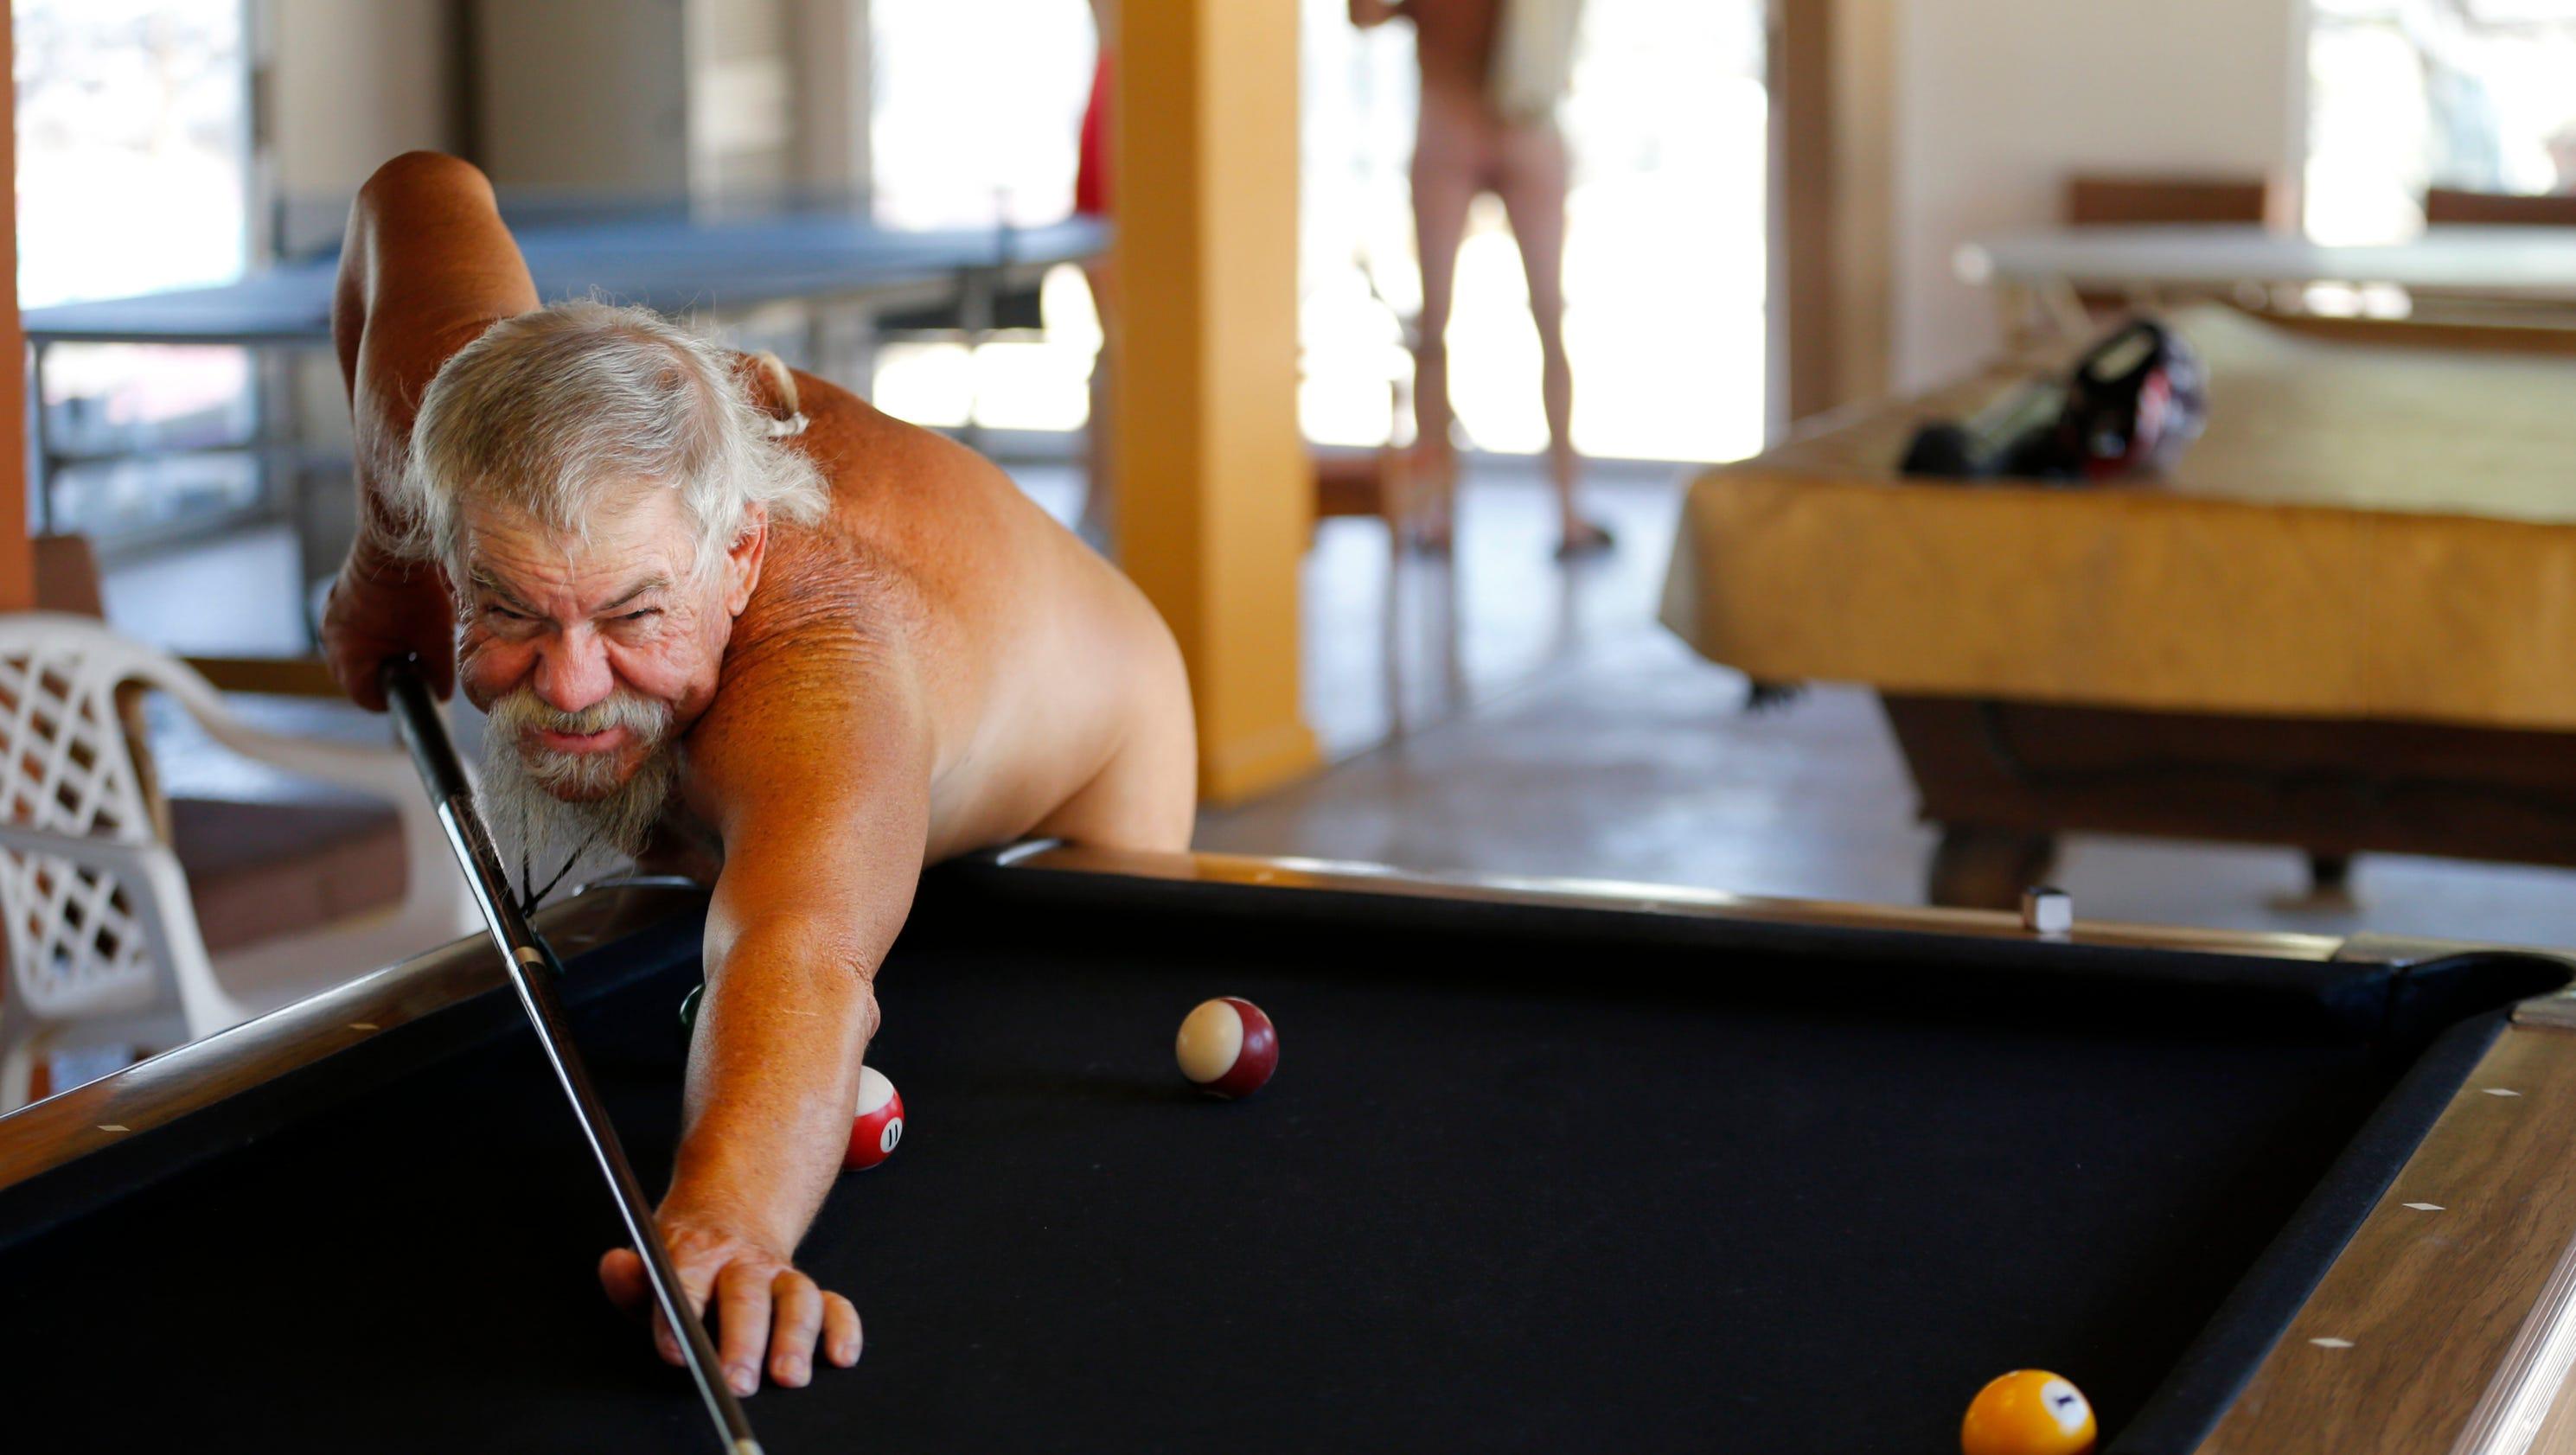 Nude Record 60